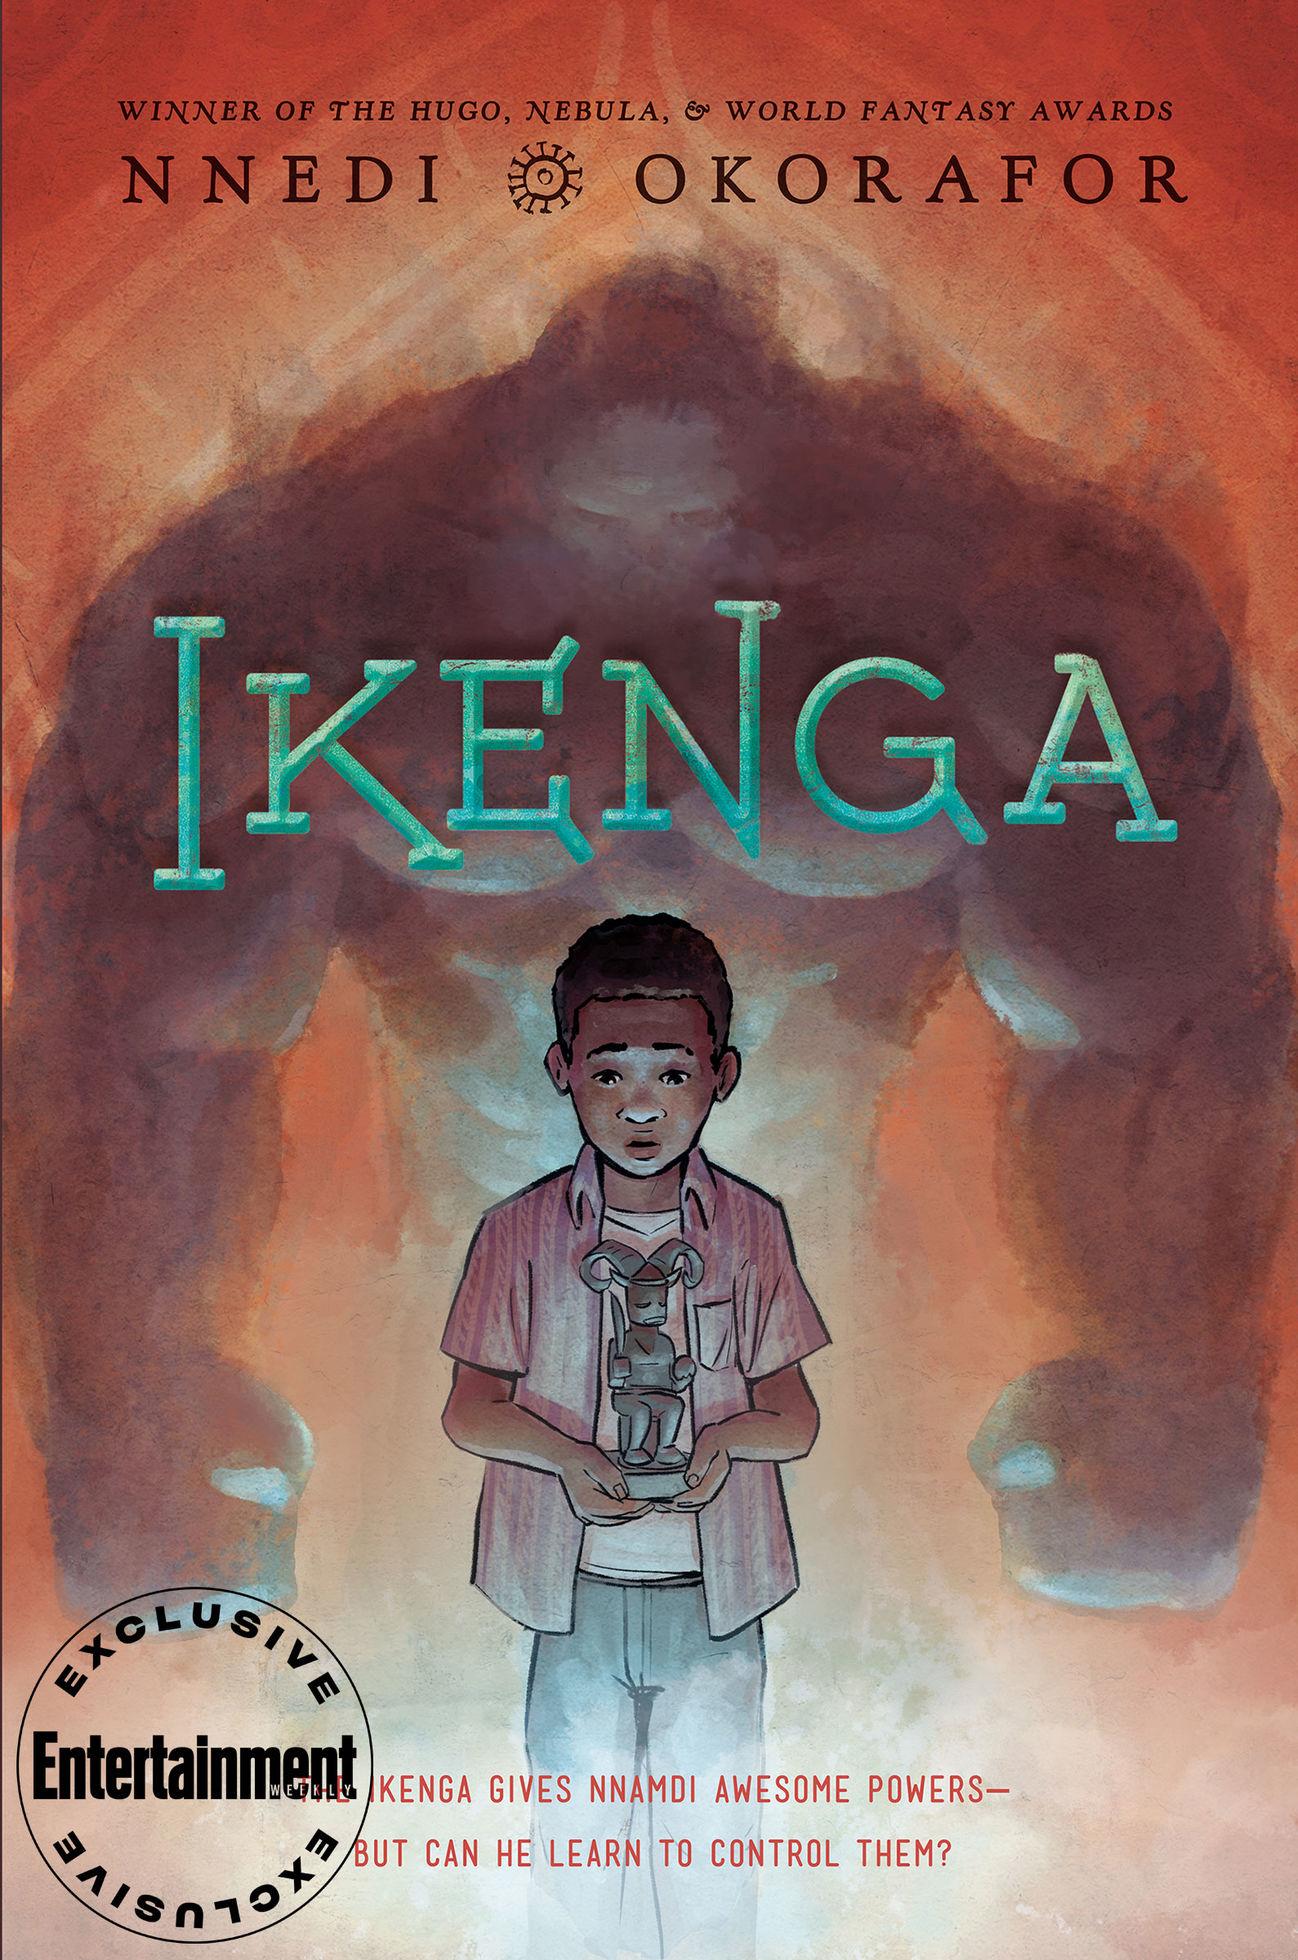 Nnedi Okorafor - Ses conseils d'écriture